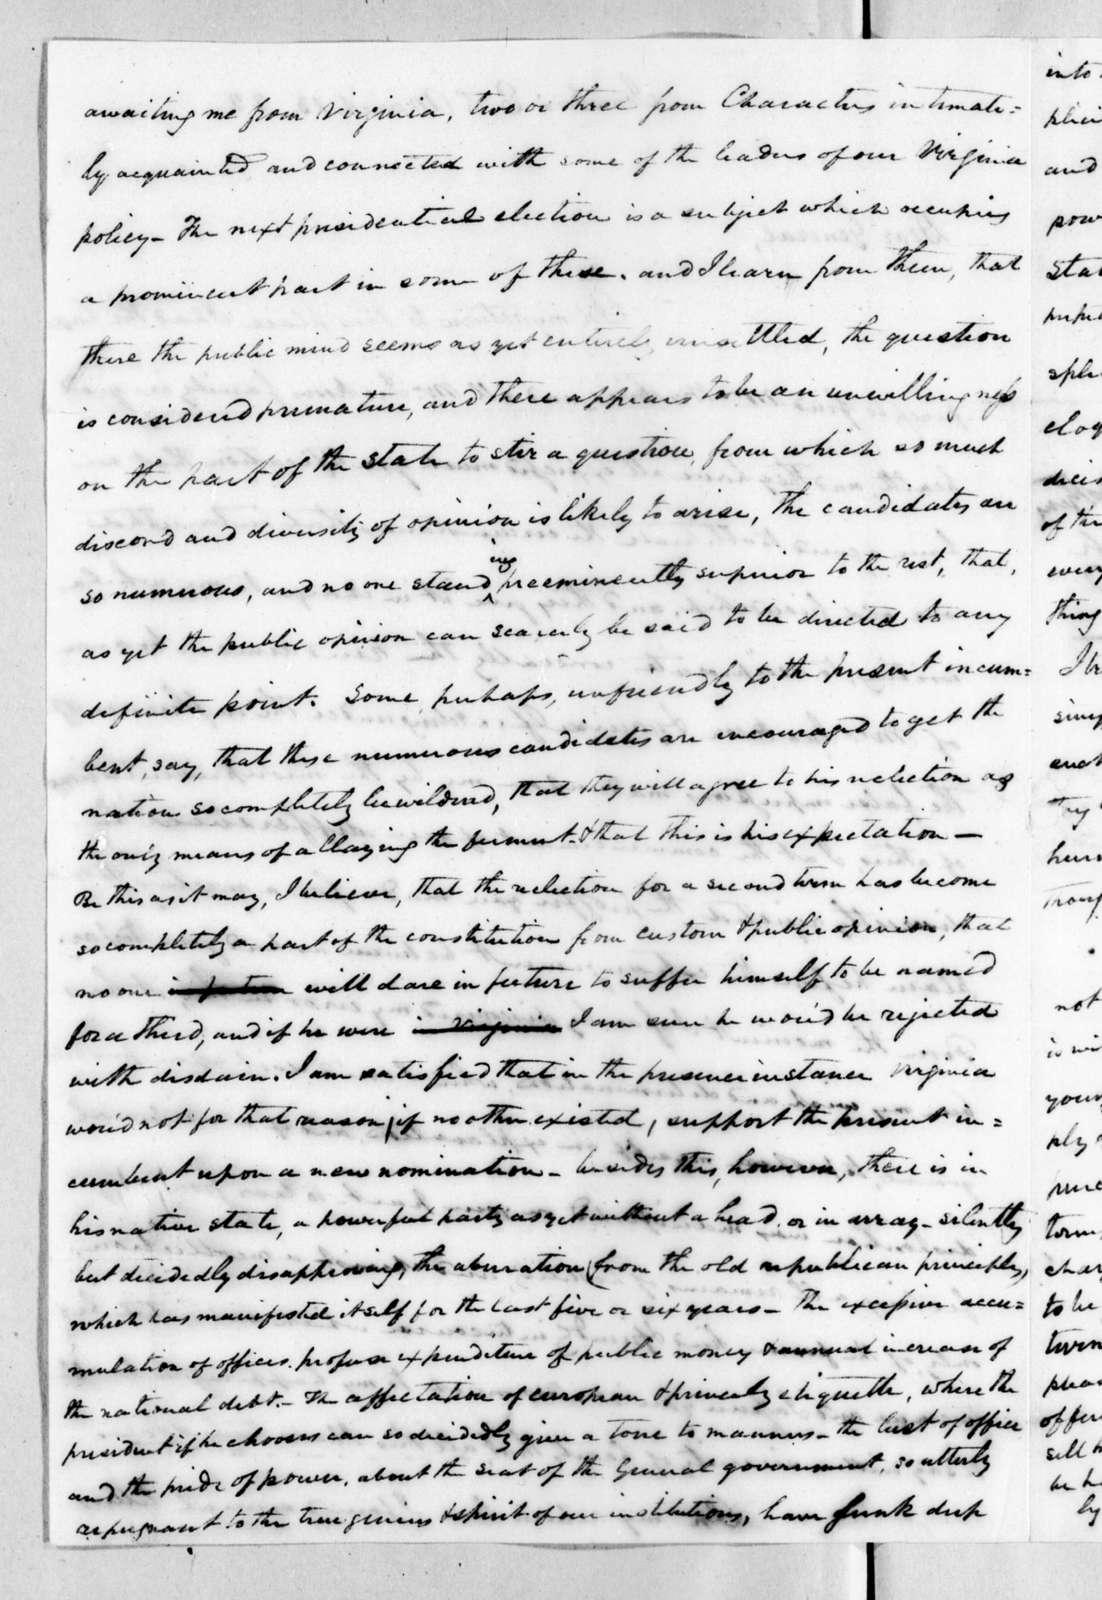 Thomas Gassaway Watkins to Andrew Jackson, March 13, 1822